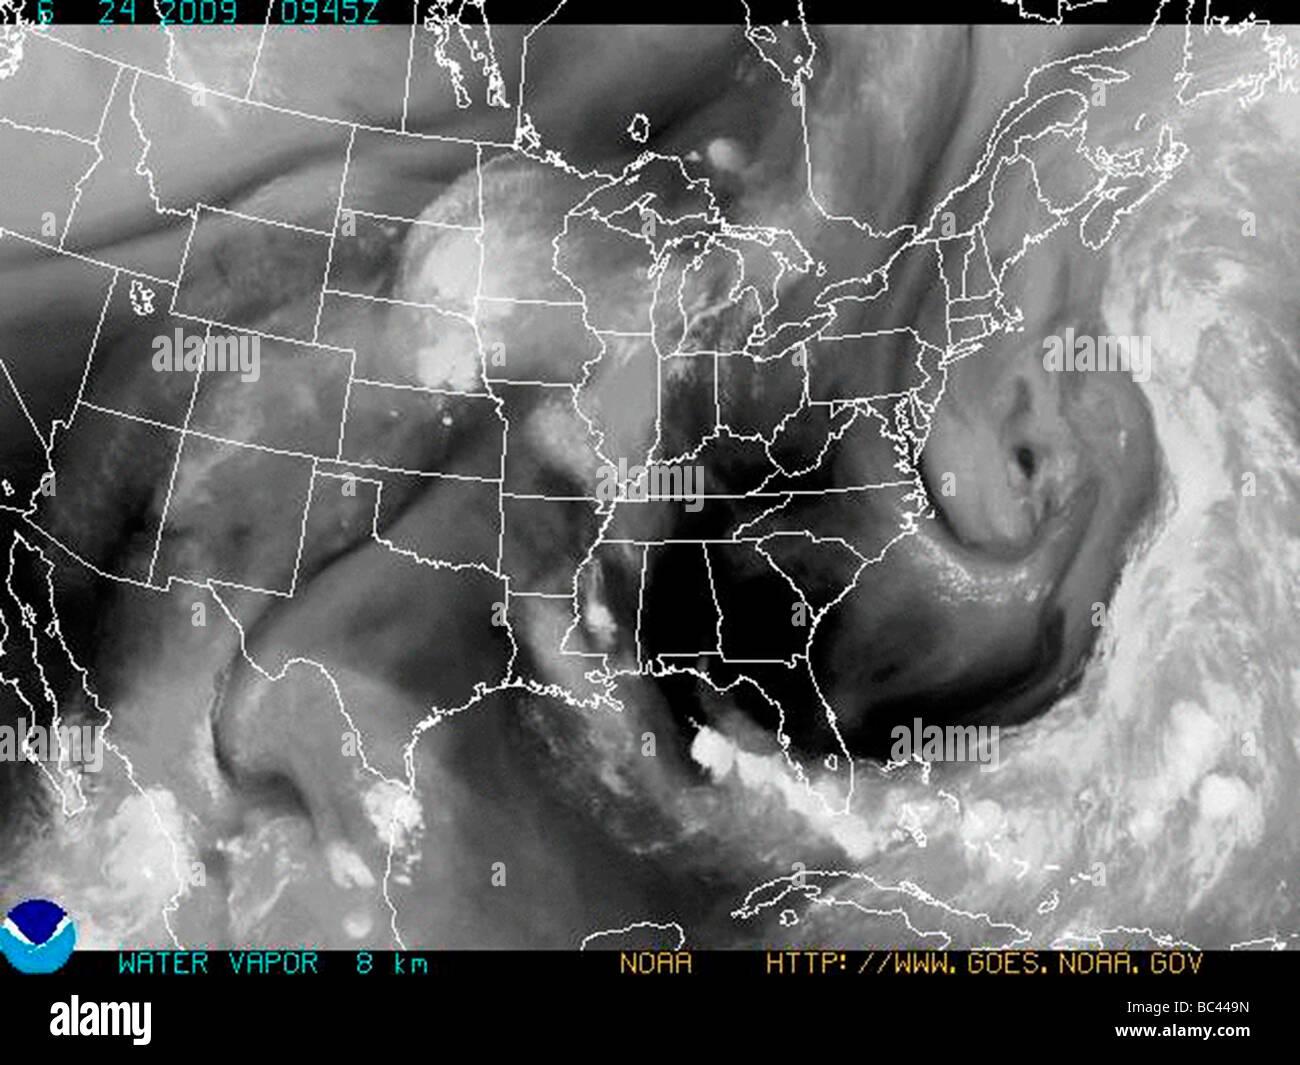 NOAA Satellite Weather Map Of United States Stock Photo Royalty - Satellite weather map